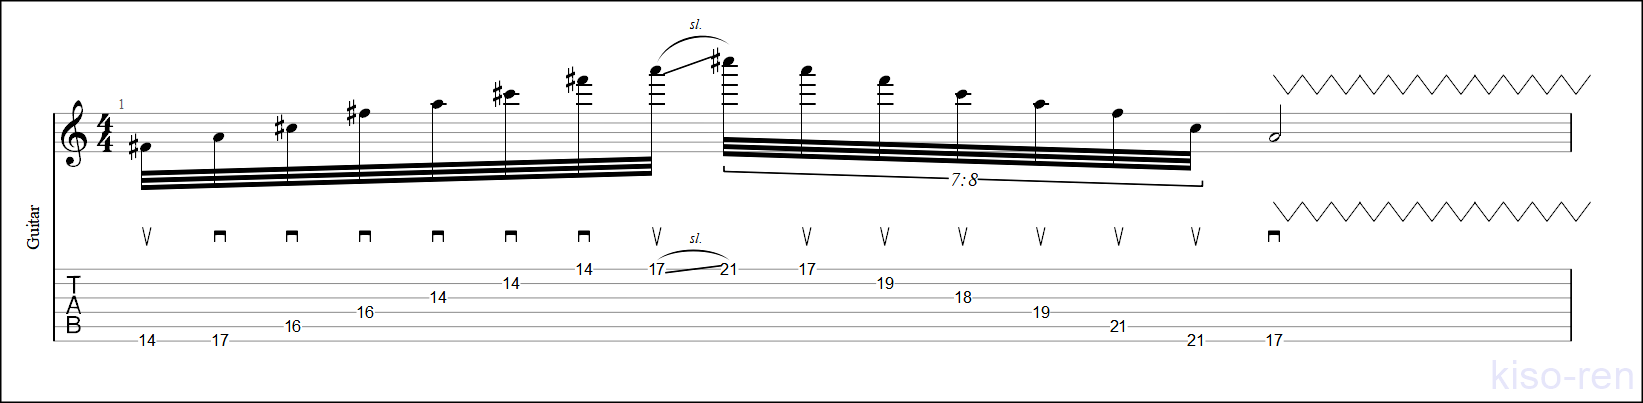 F#m Sweep Picking【TAB】Big Sweep Picking John Petrucci  6弦スウィープピッキング ジョン・ペトルーシ 練習【Practice TAB】